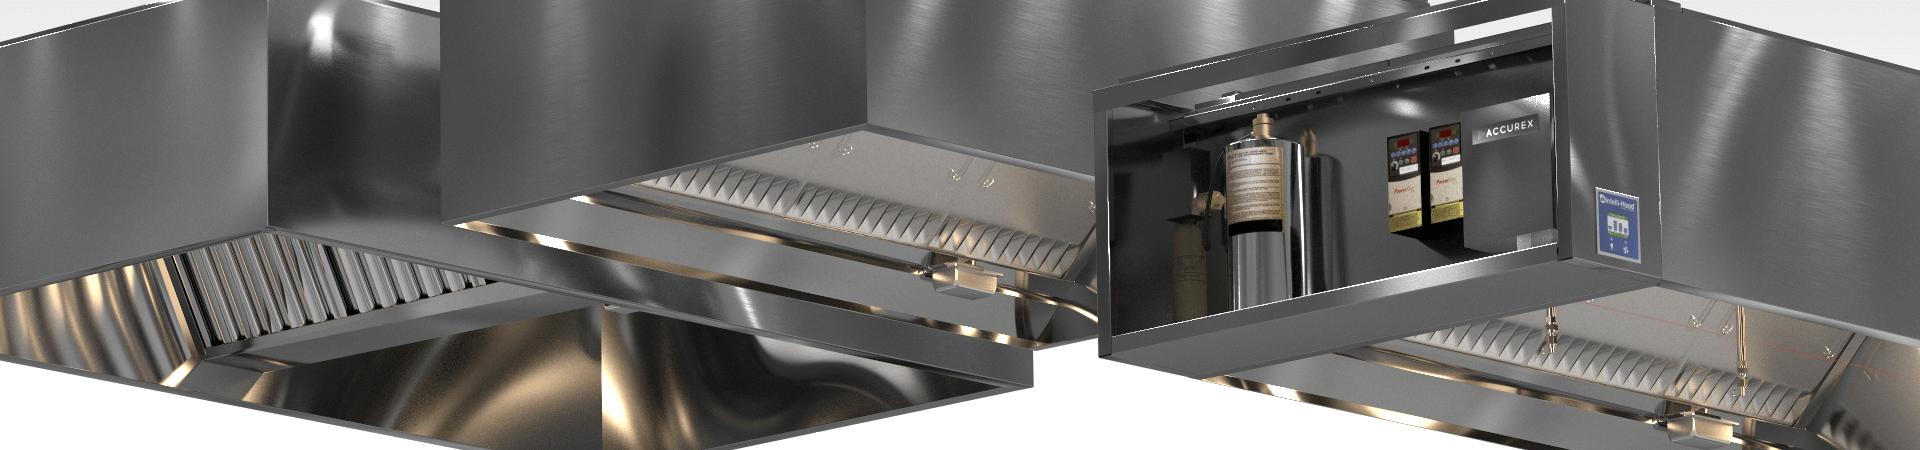 Kitchen Ventilation Systems | Greenheck